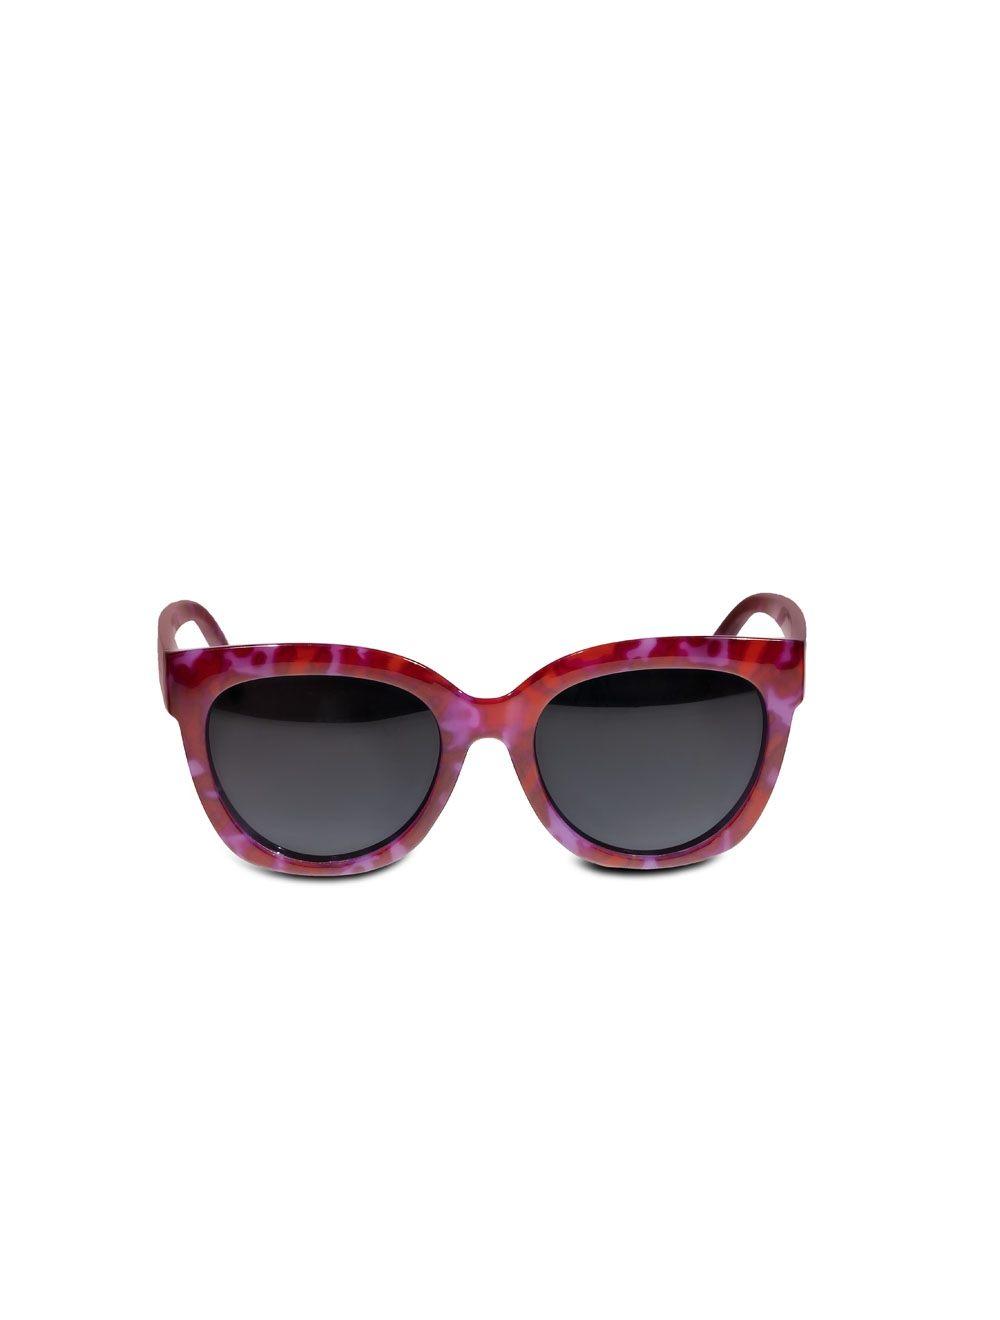 Jo Sunglasses - Flame Scarlet